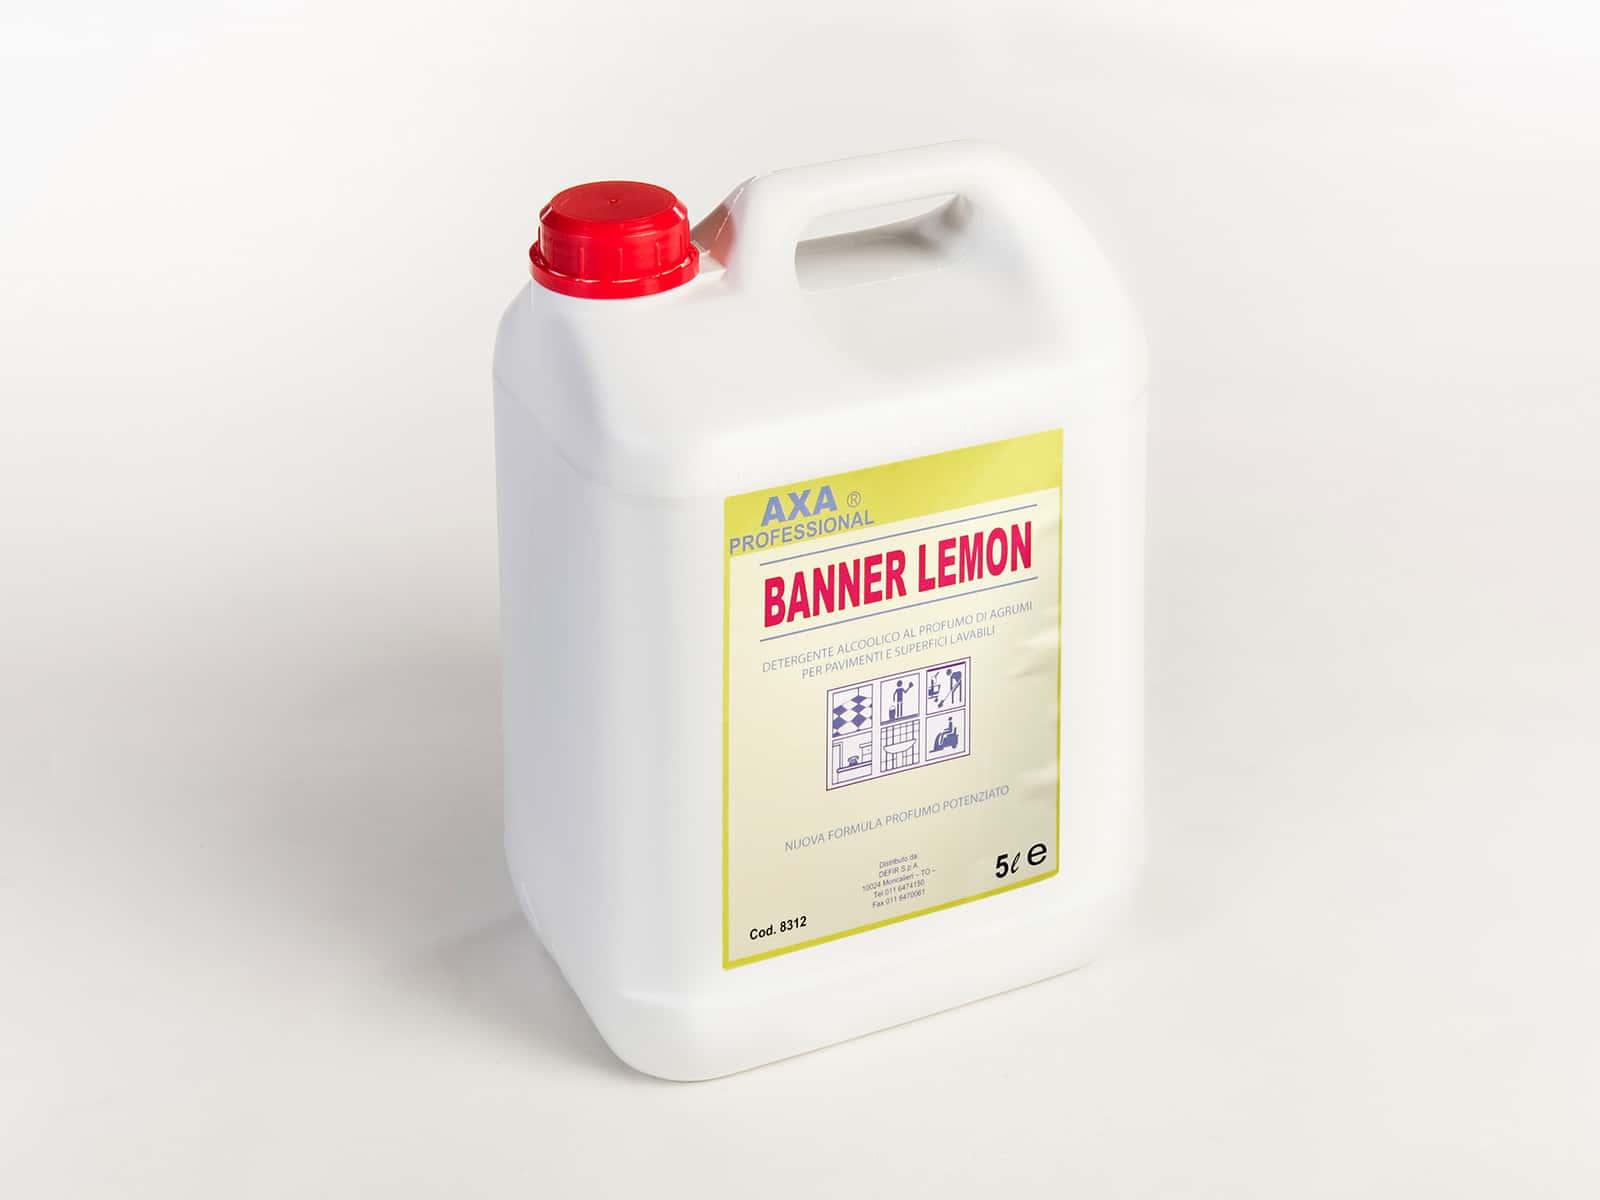 Axa Banner Lemon detersivo superfici profumato - Defir detergenti Moncalieri Torino